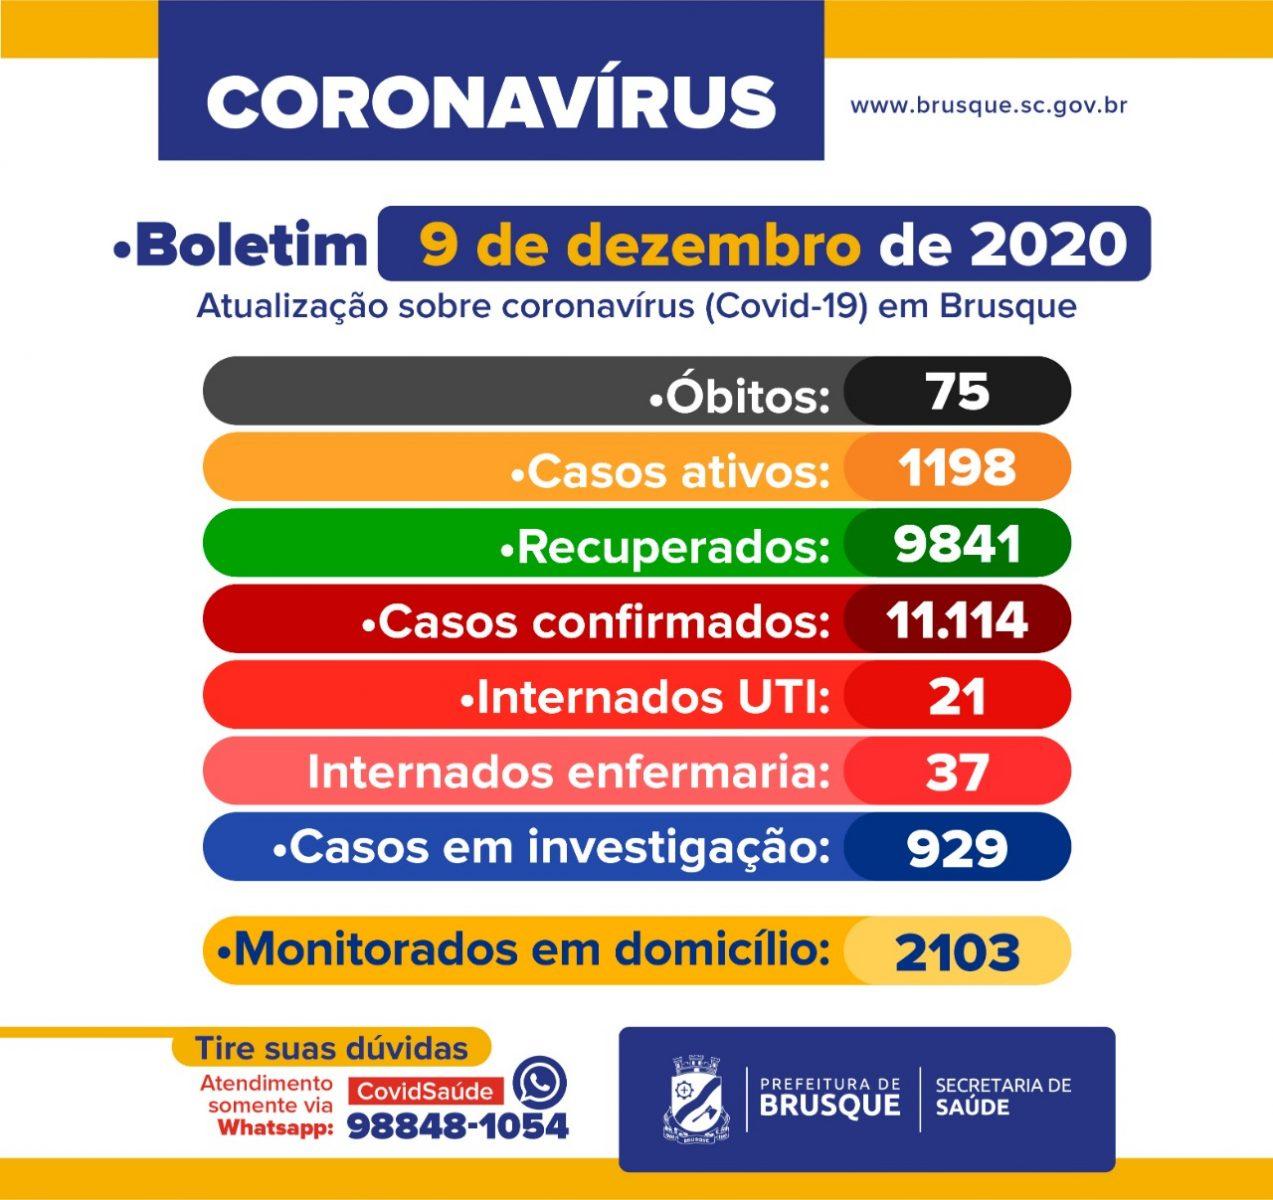 Covid-19: Boletim epidemiológico de 9 de dezembro